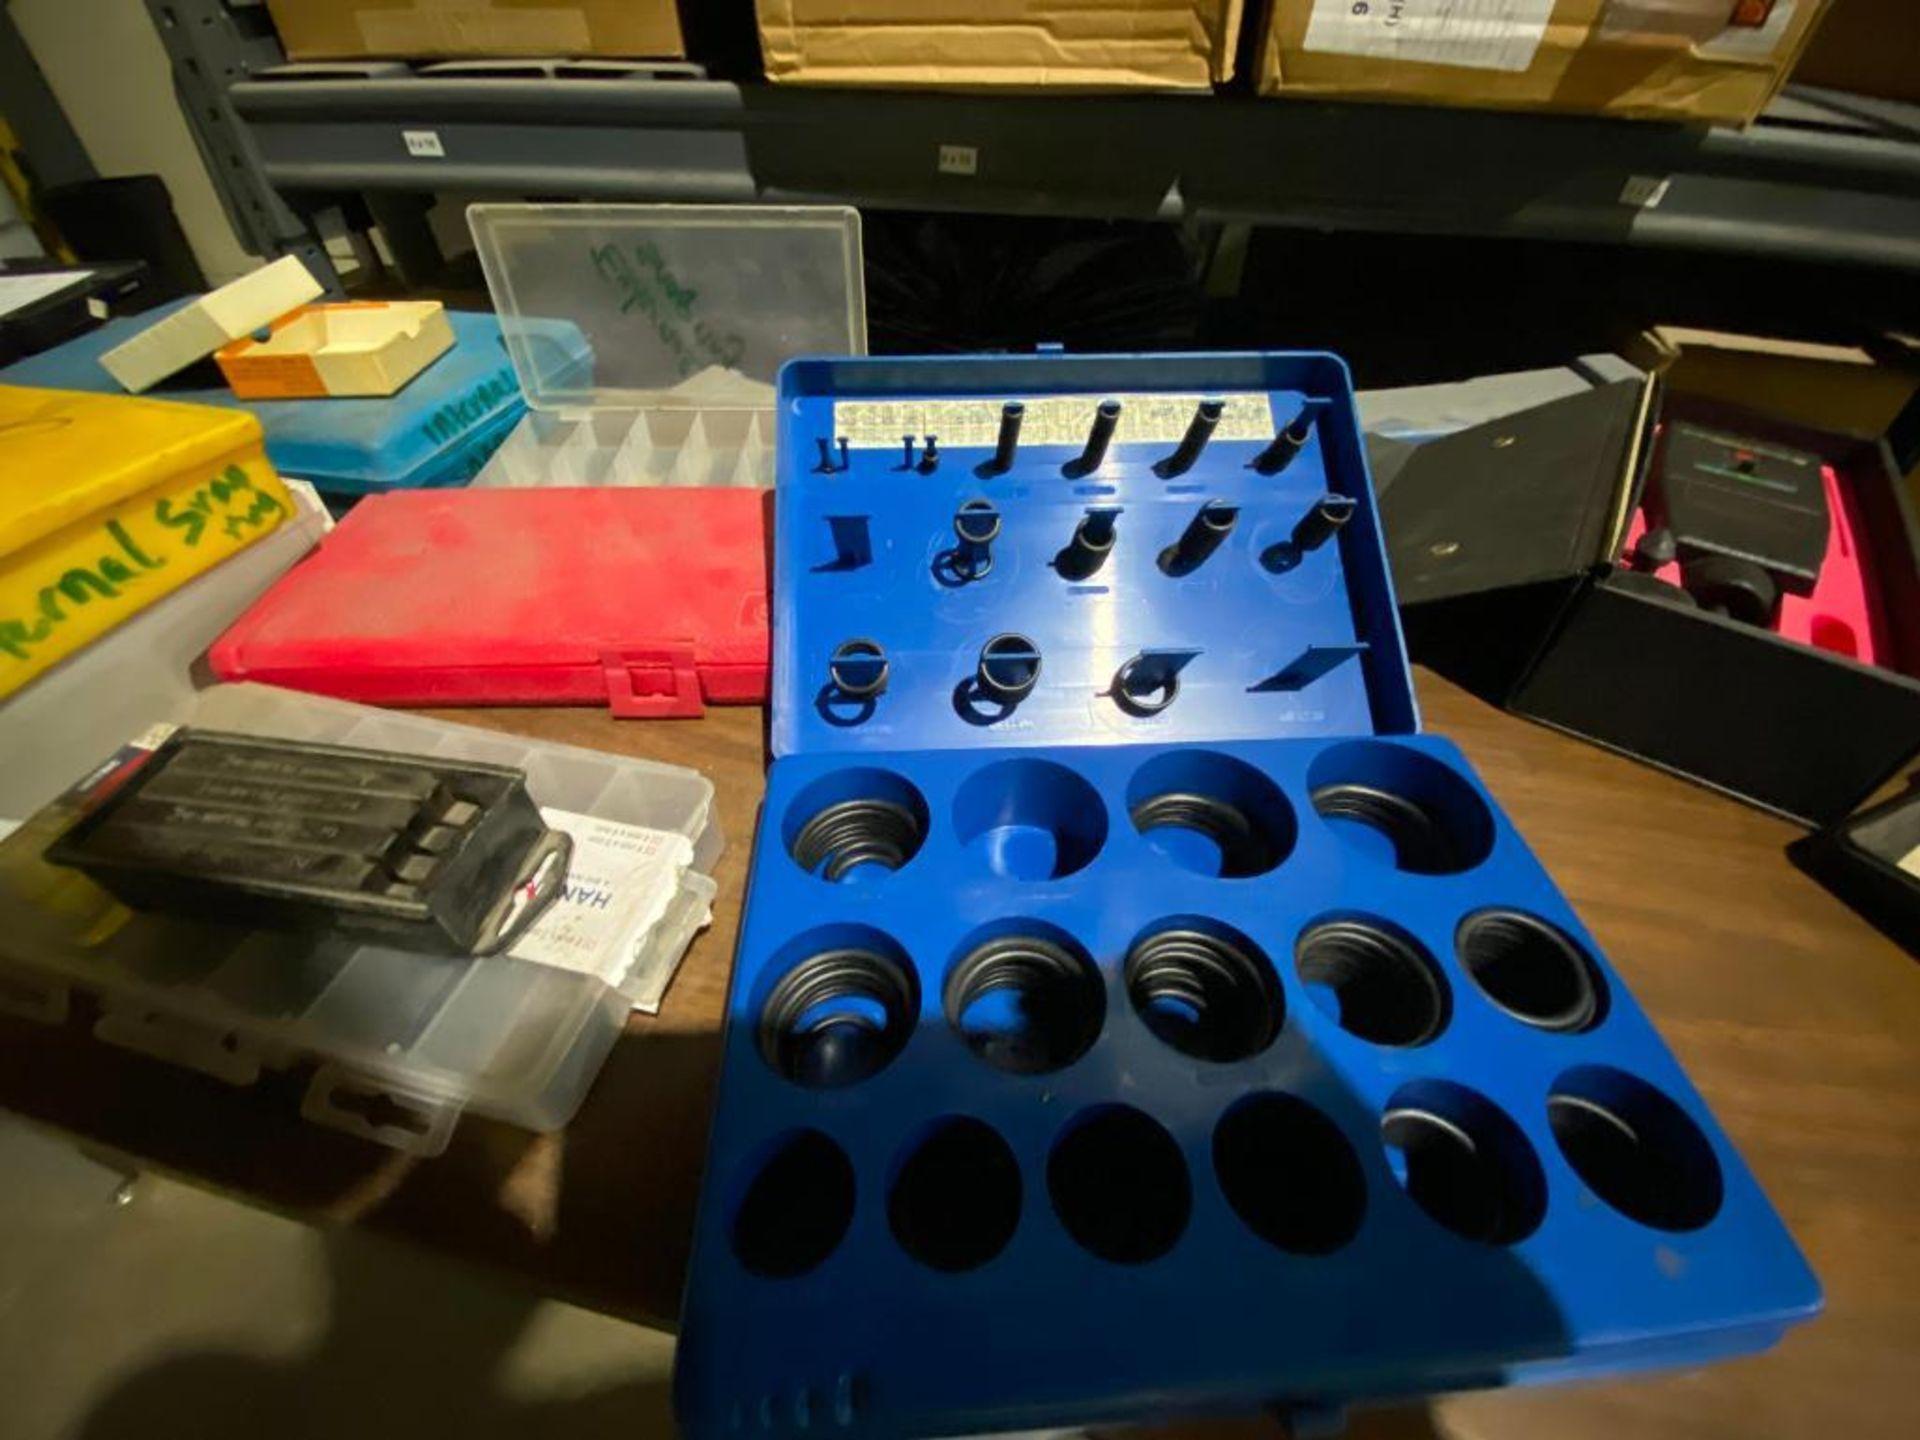 measuring equipment and thread repair - Image 15 of 18